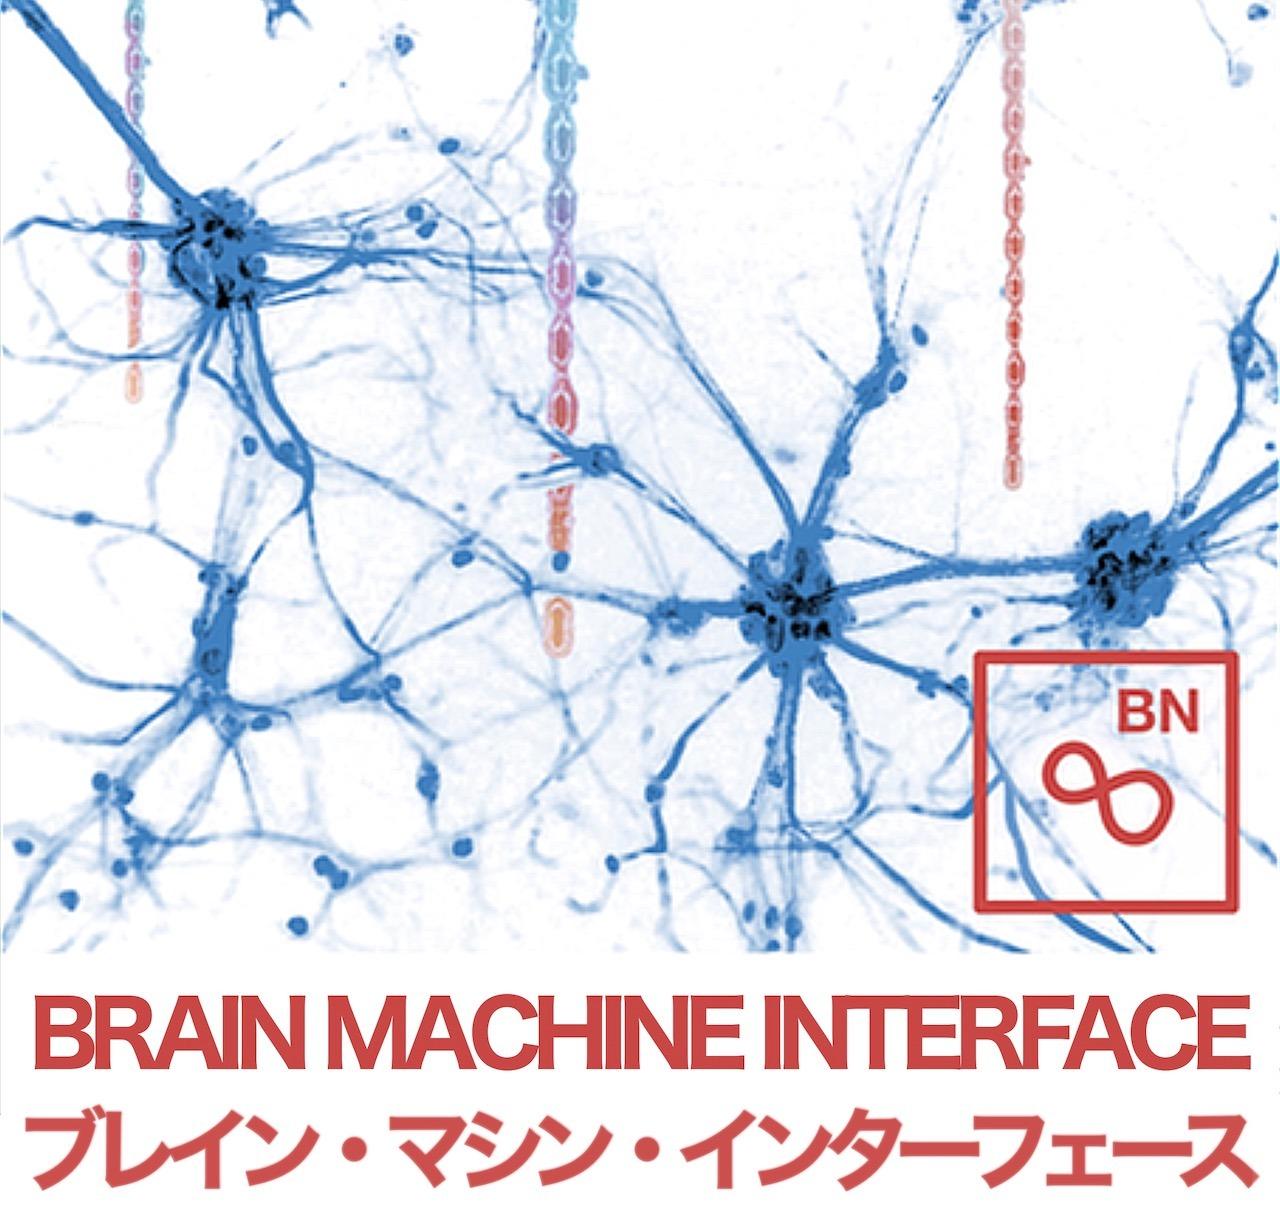 Brain Machine Interface | ブレイン・マシン・インターフェース